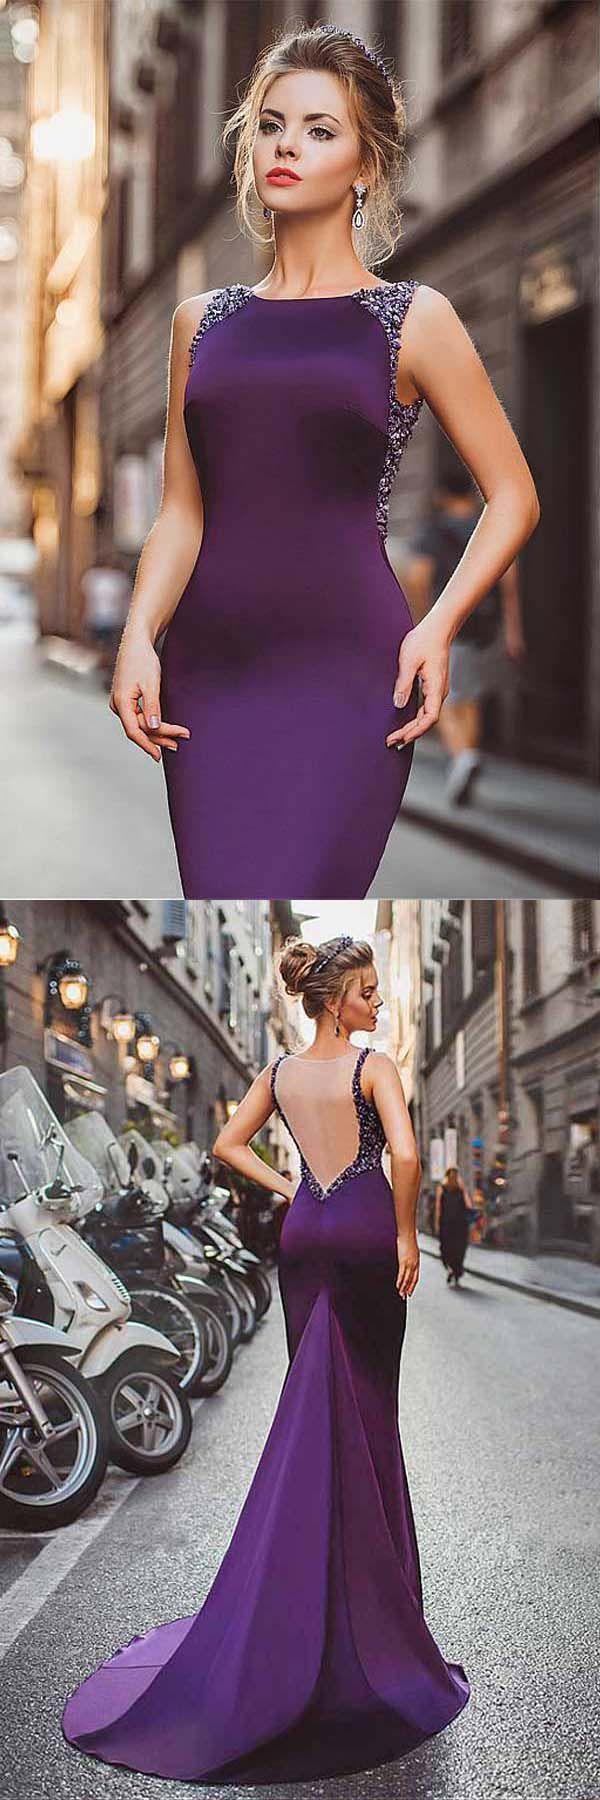 Neckline Satin Purple Mermaid Evening Dresses With Beadings PG506 #prom #evening #dress #purple #mermaid